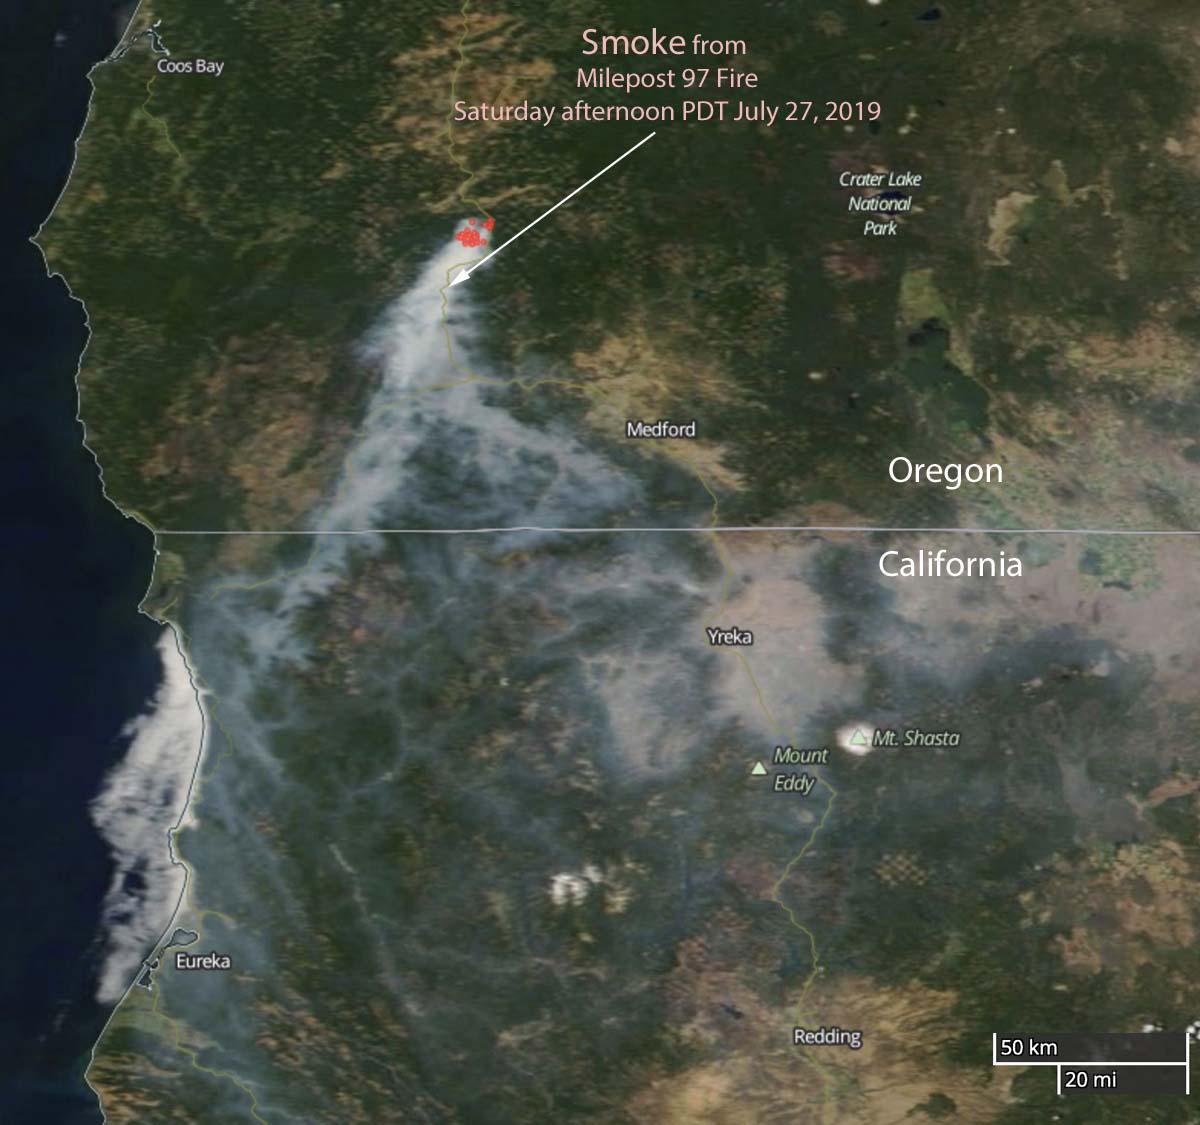 wildfire smoke Milepost 97 Fire Oregon